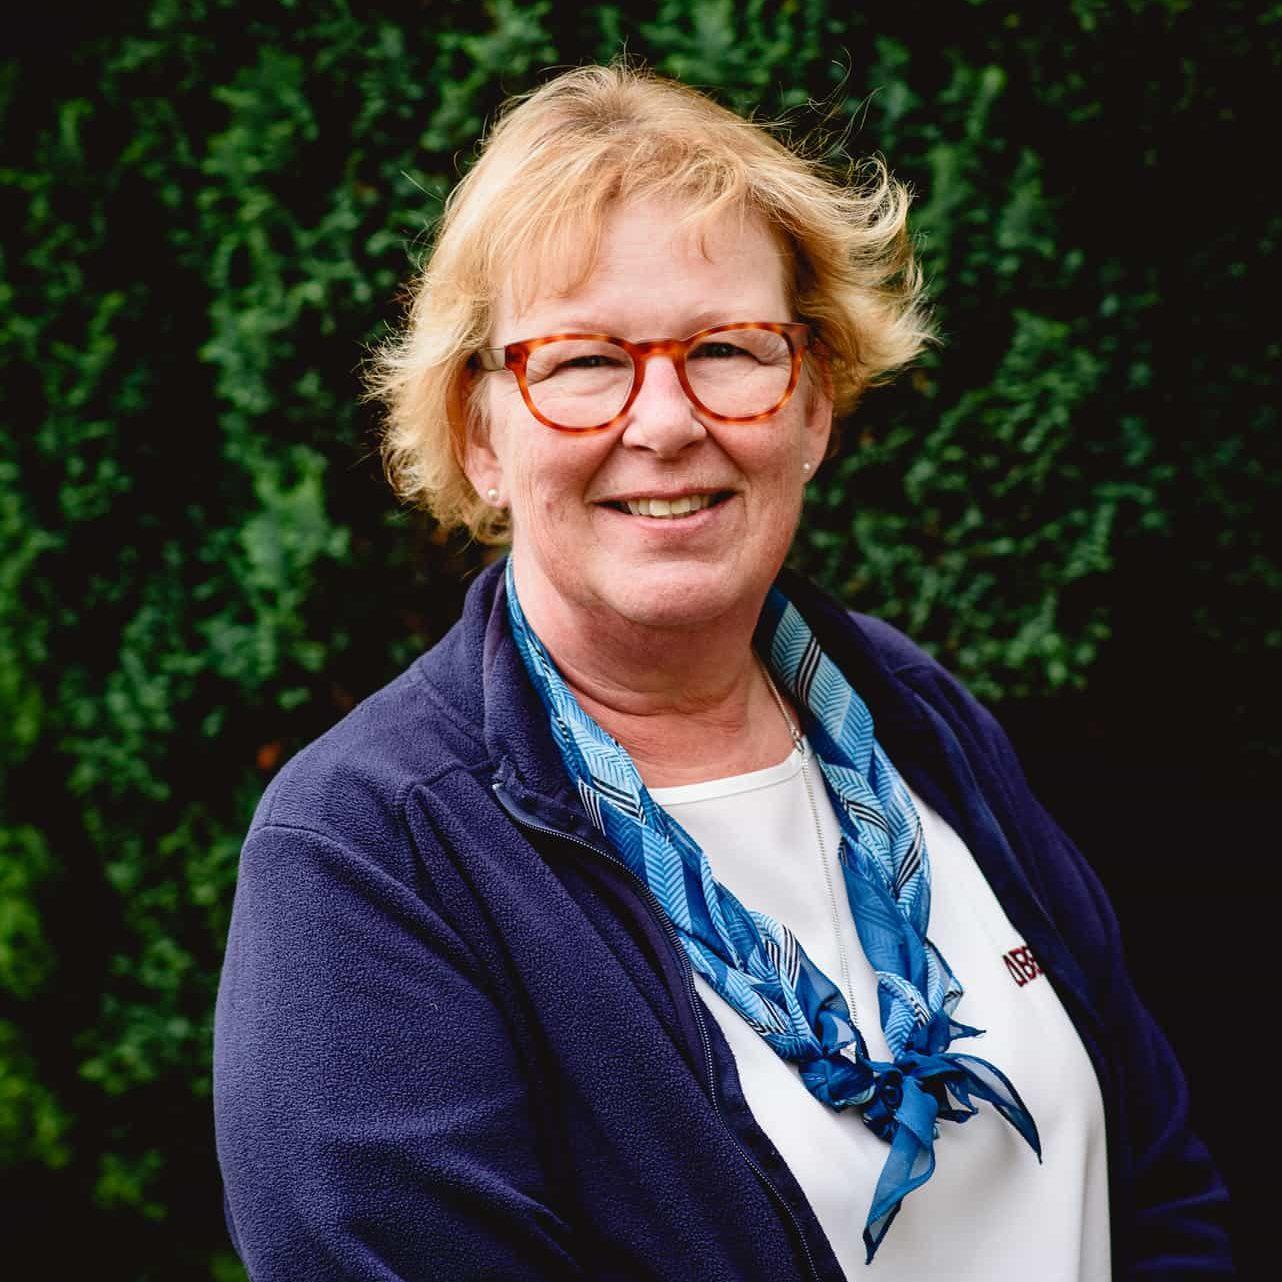 Jeanette Collins Libertas